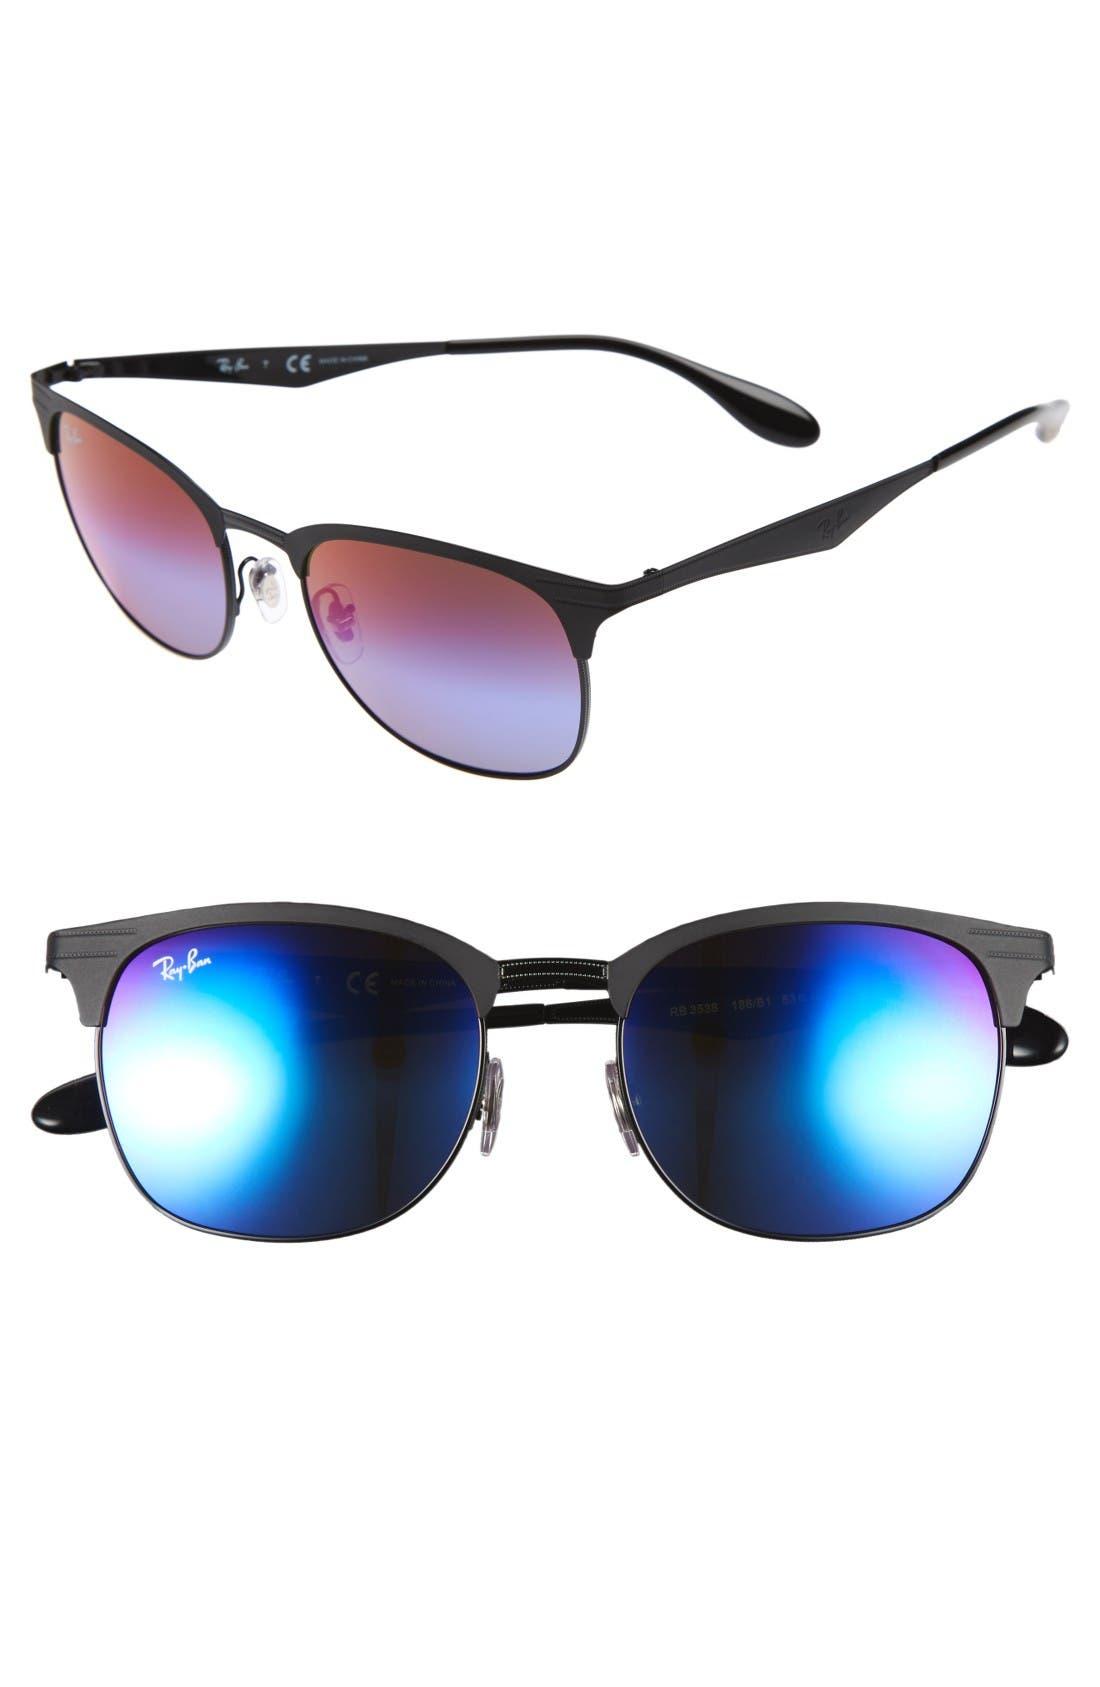 Main Image - Ray-Ban Highstreet 53mm Sunglasses